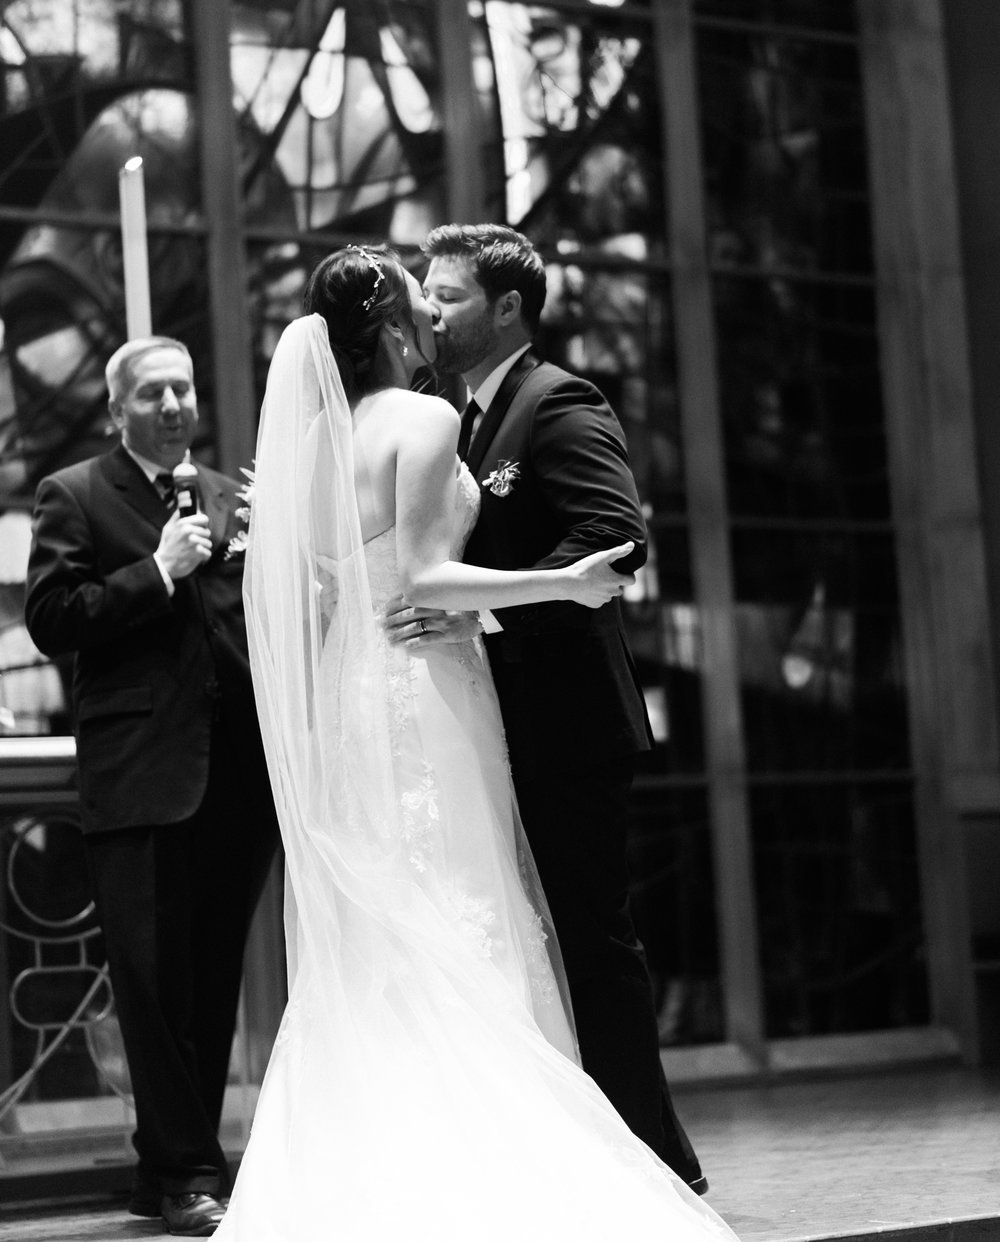 Bonphotage Chicago Wedding Photographer - Alice Millar Chapel Northwestern